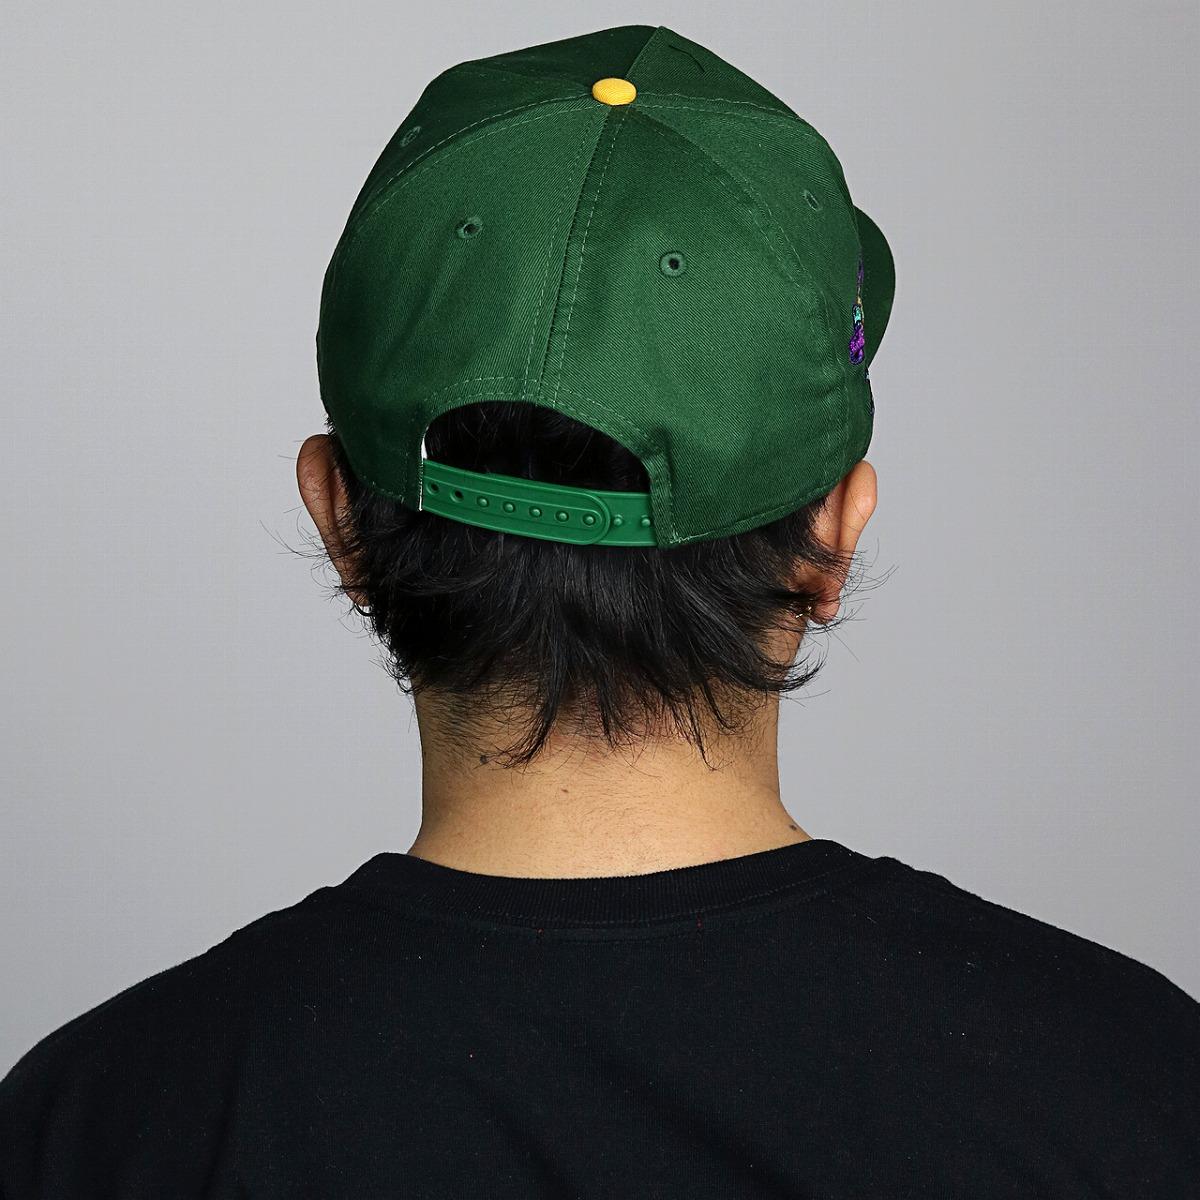 new product 8db37 60665 ... Cap men new gills sports NEWERA hat American football Green Bay Packers  new era 9FIFTY baseball ...